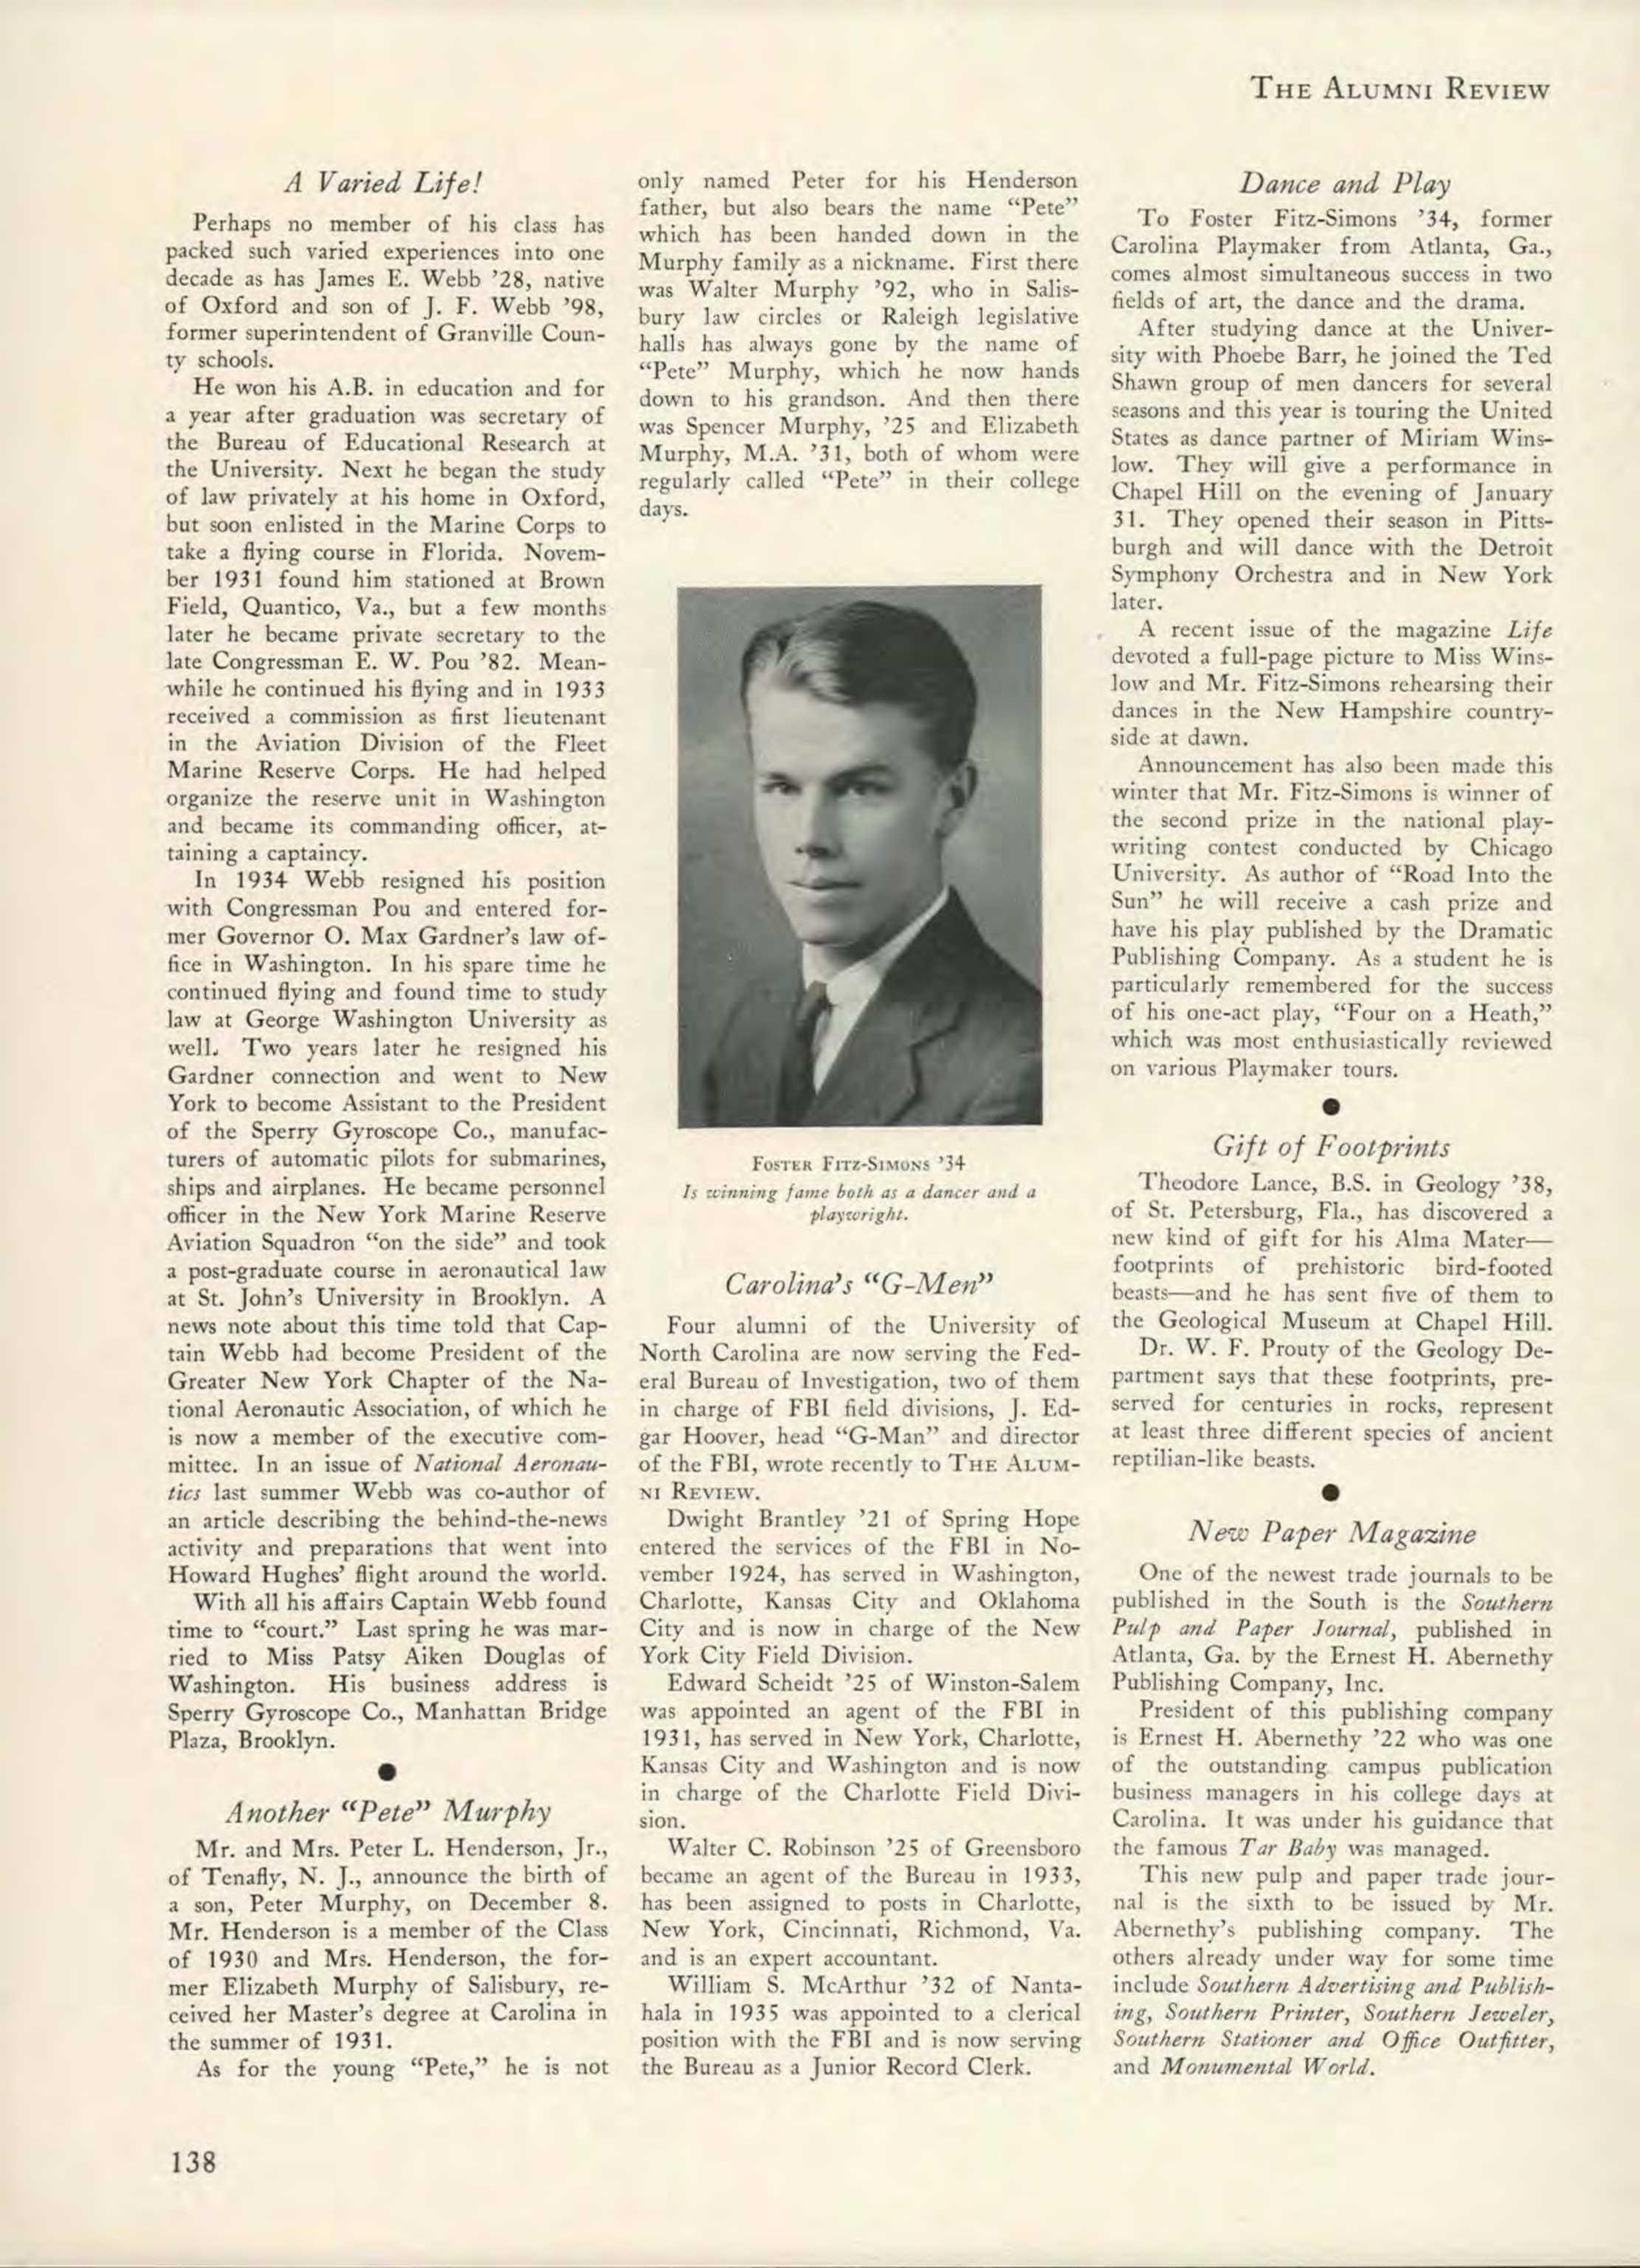 Carolina Alumni Review - January 1939 - page 137